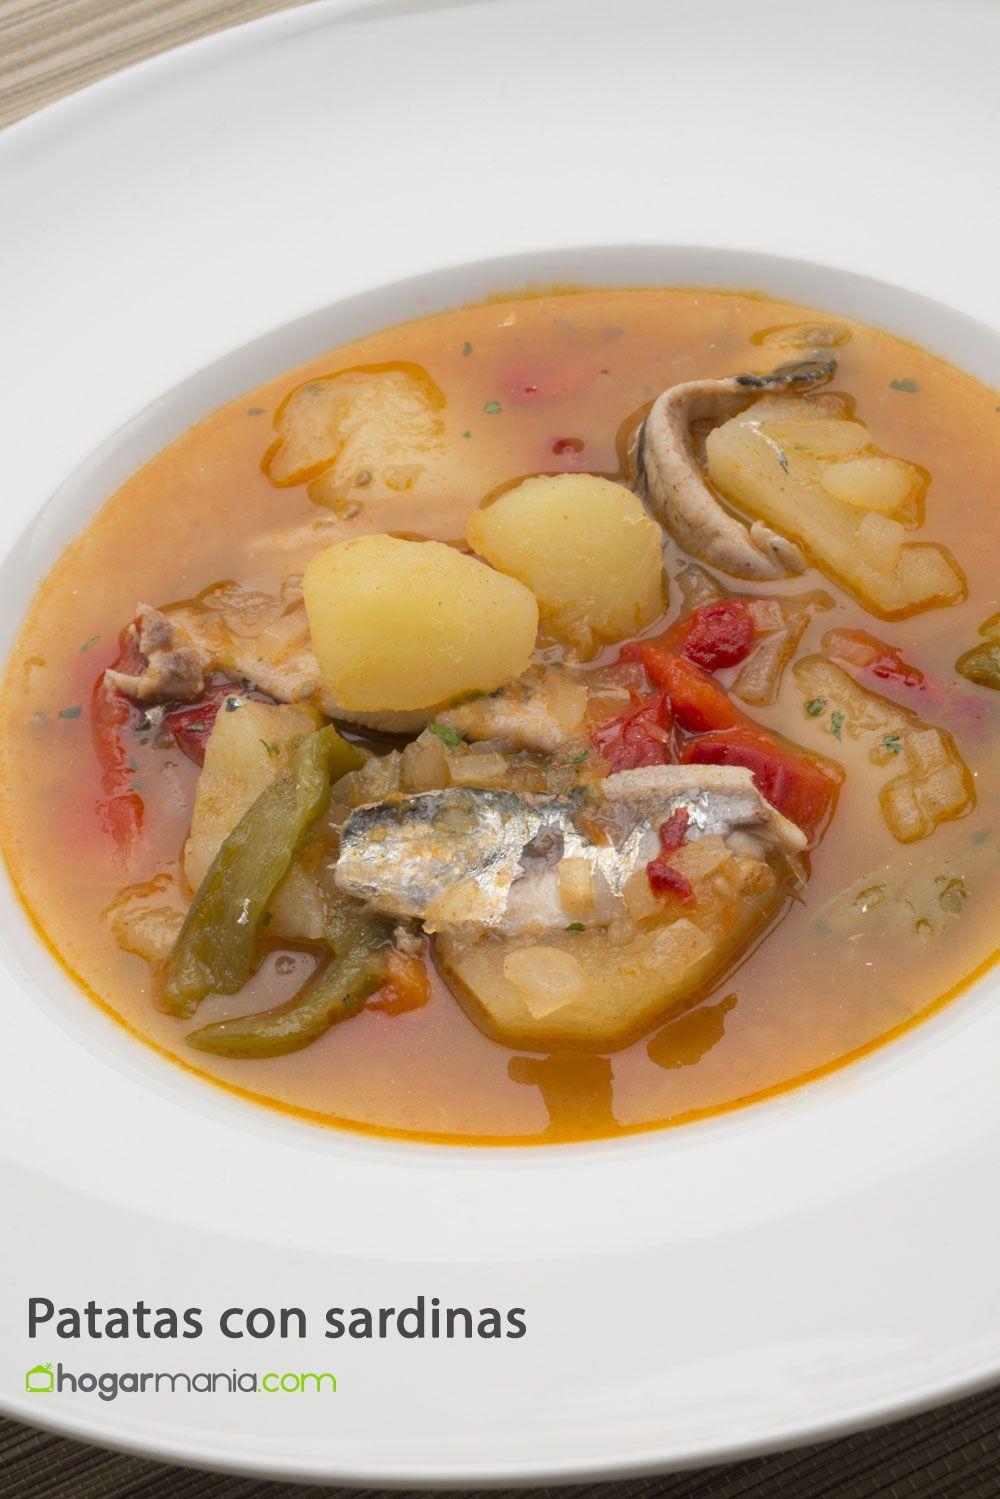 Receta de patatas con sardinas karlos argui ano - Como cocinar sardinas ...